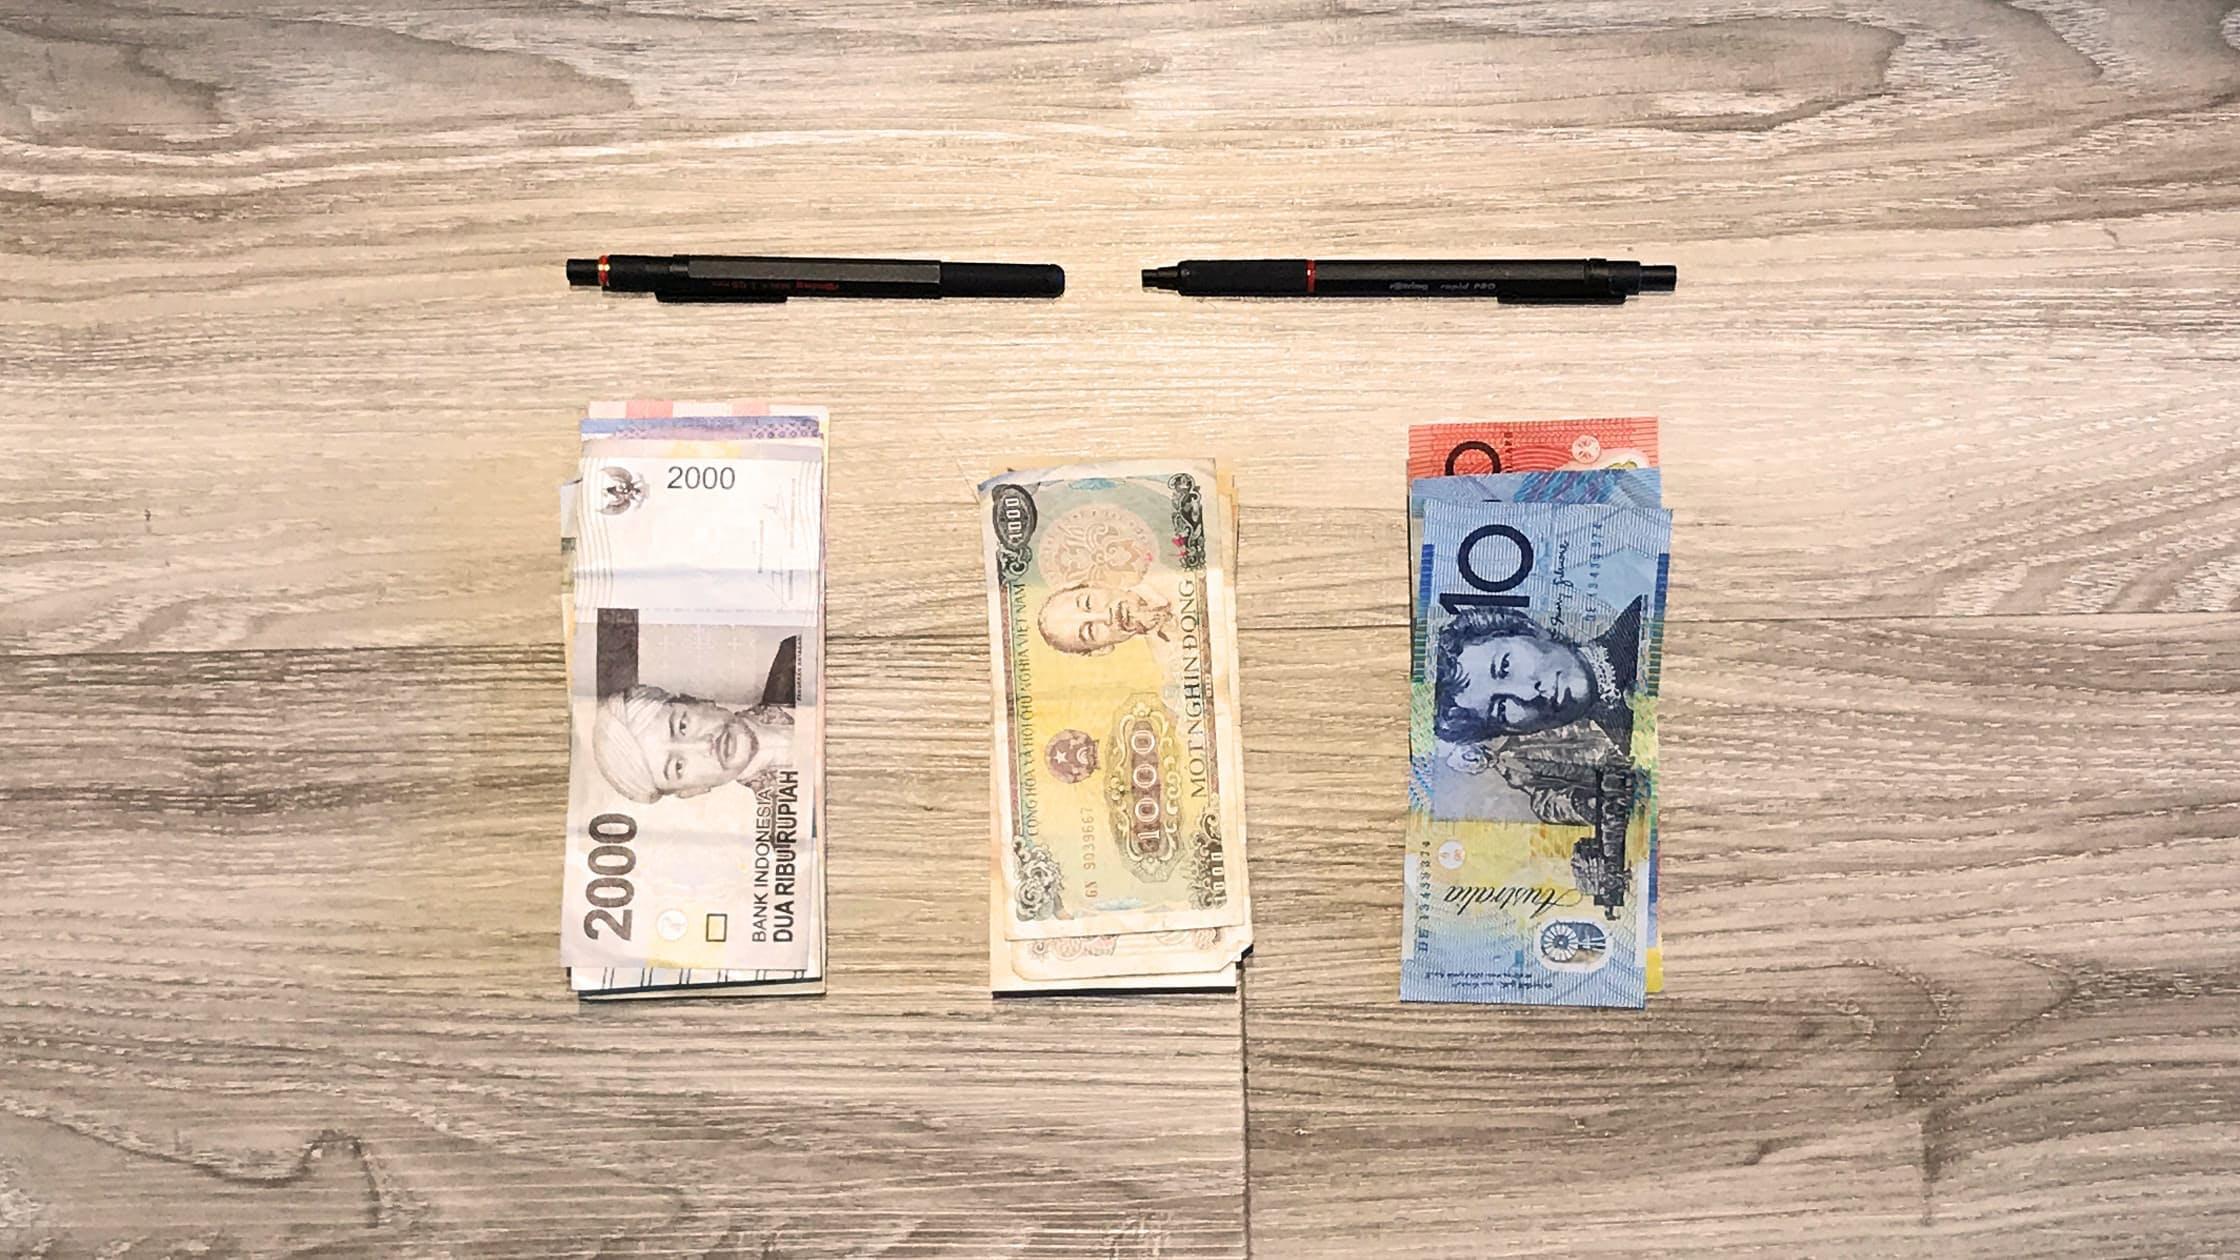 Secondary Small Zip Pocket Example Items | GORCK GR2